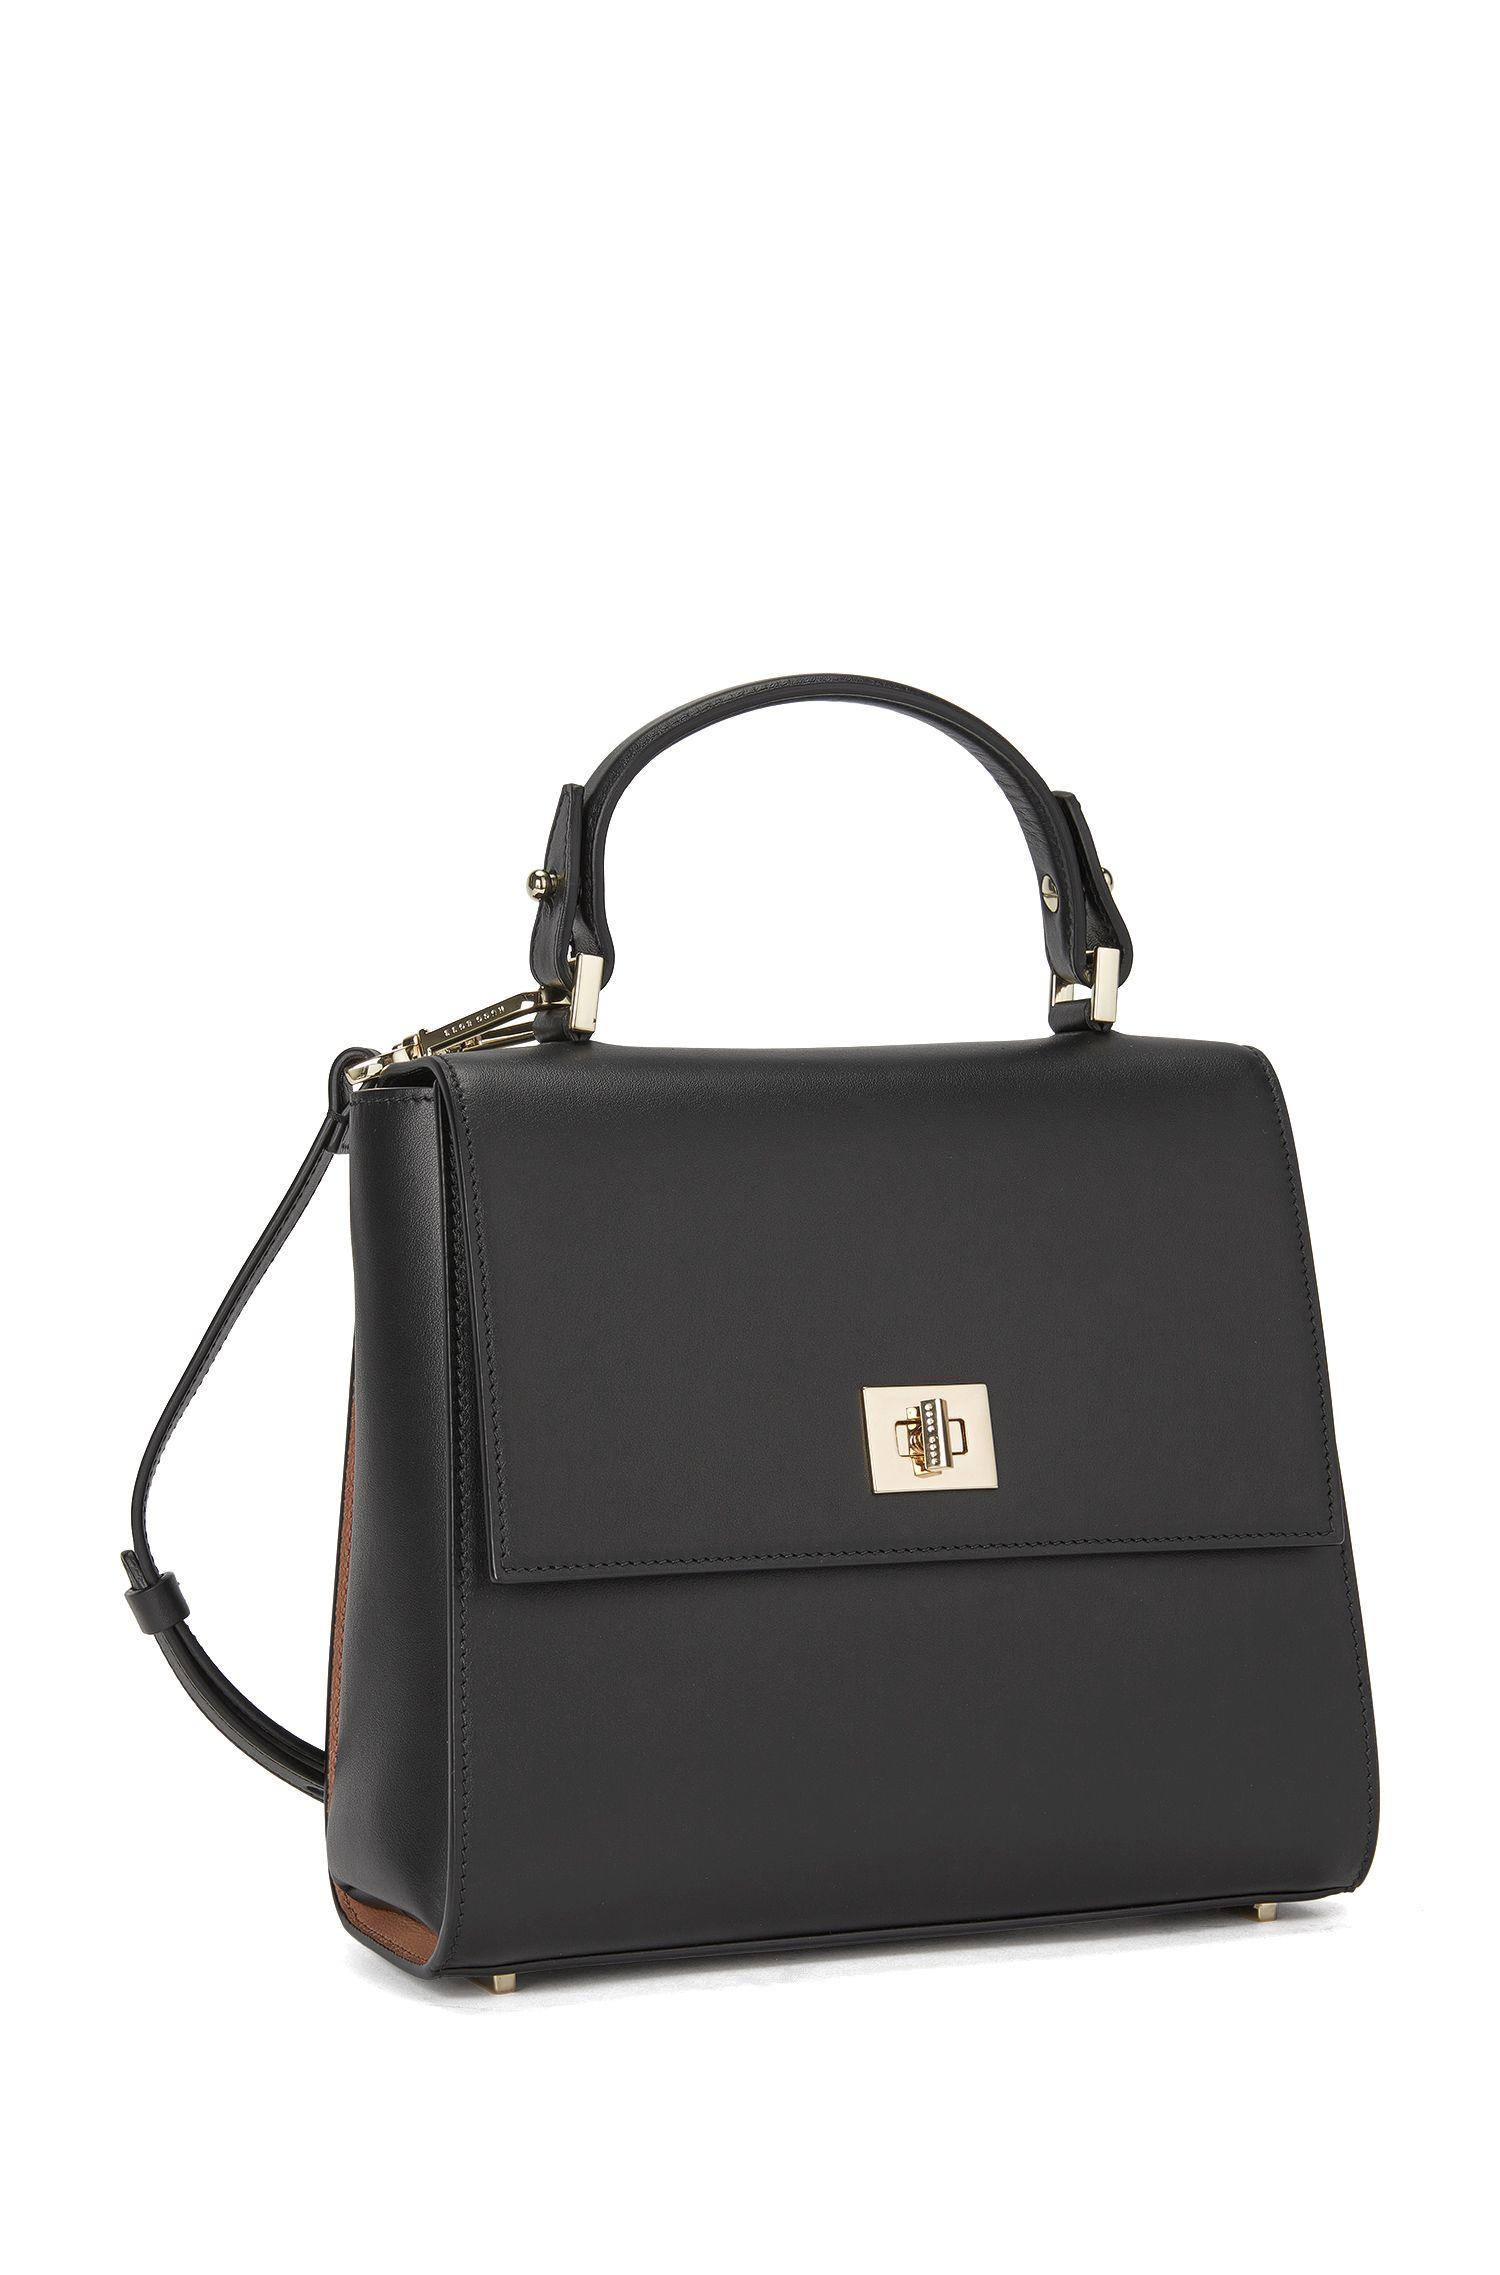 Bespoke handbag in smooth leather BOSS